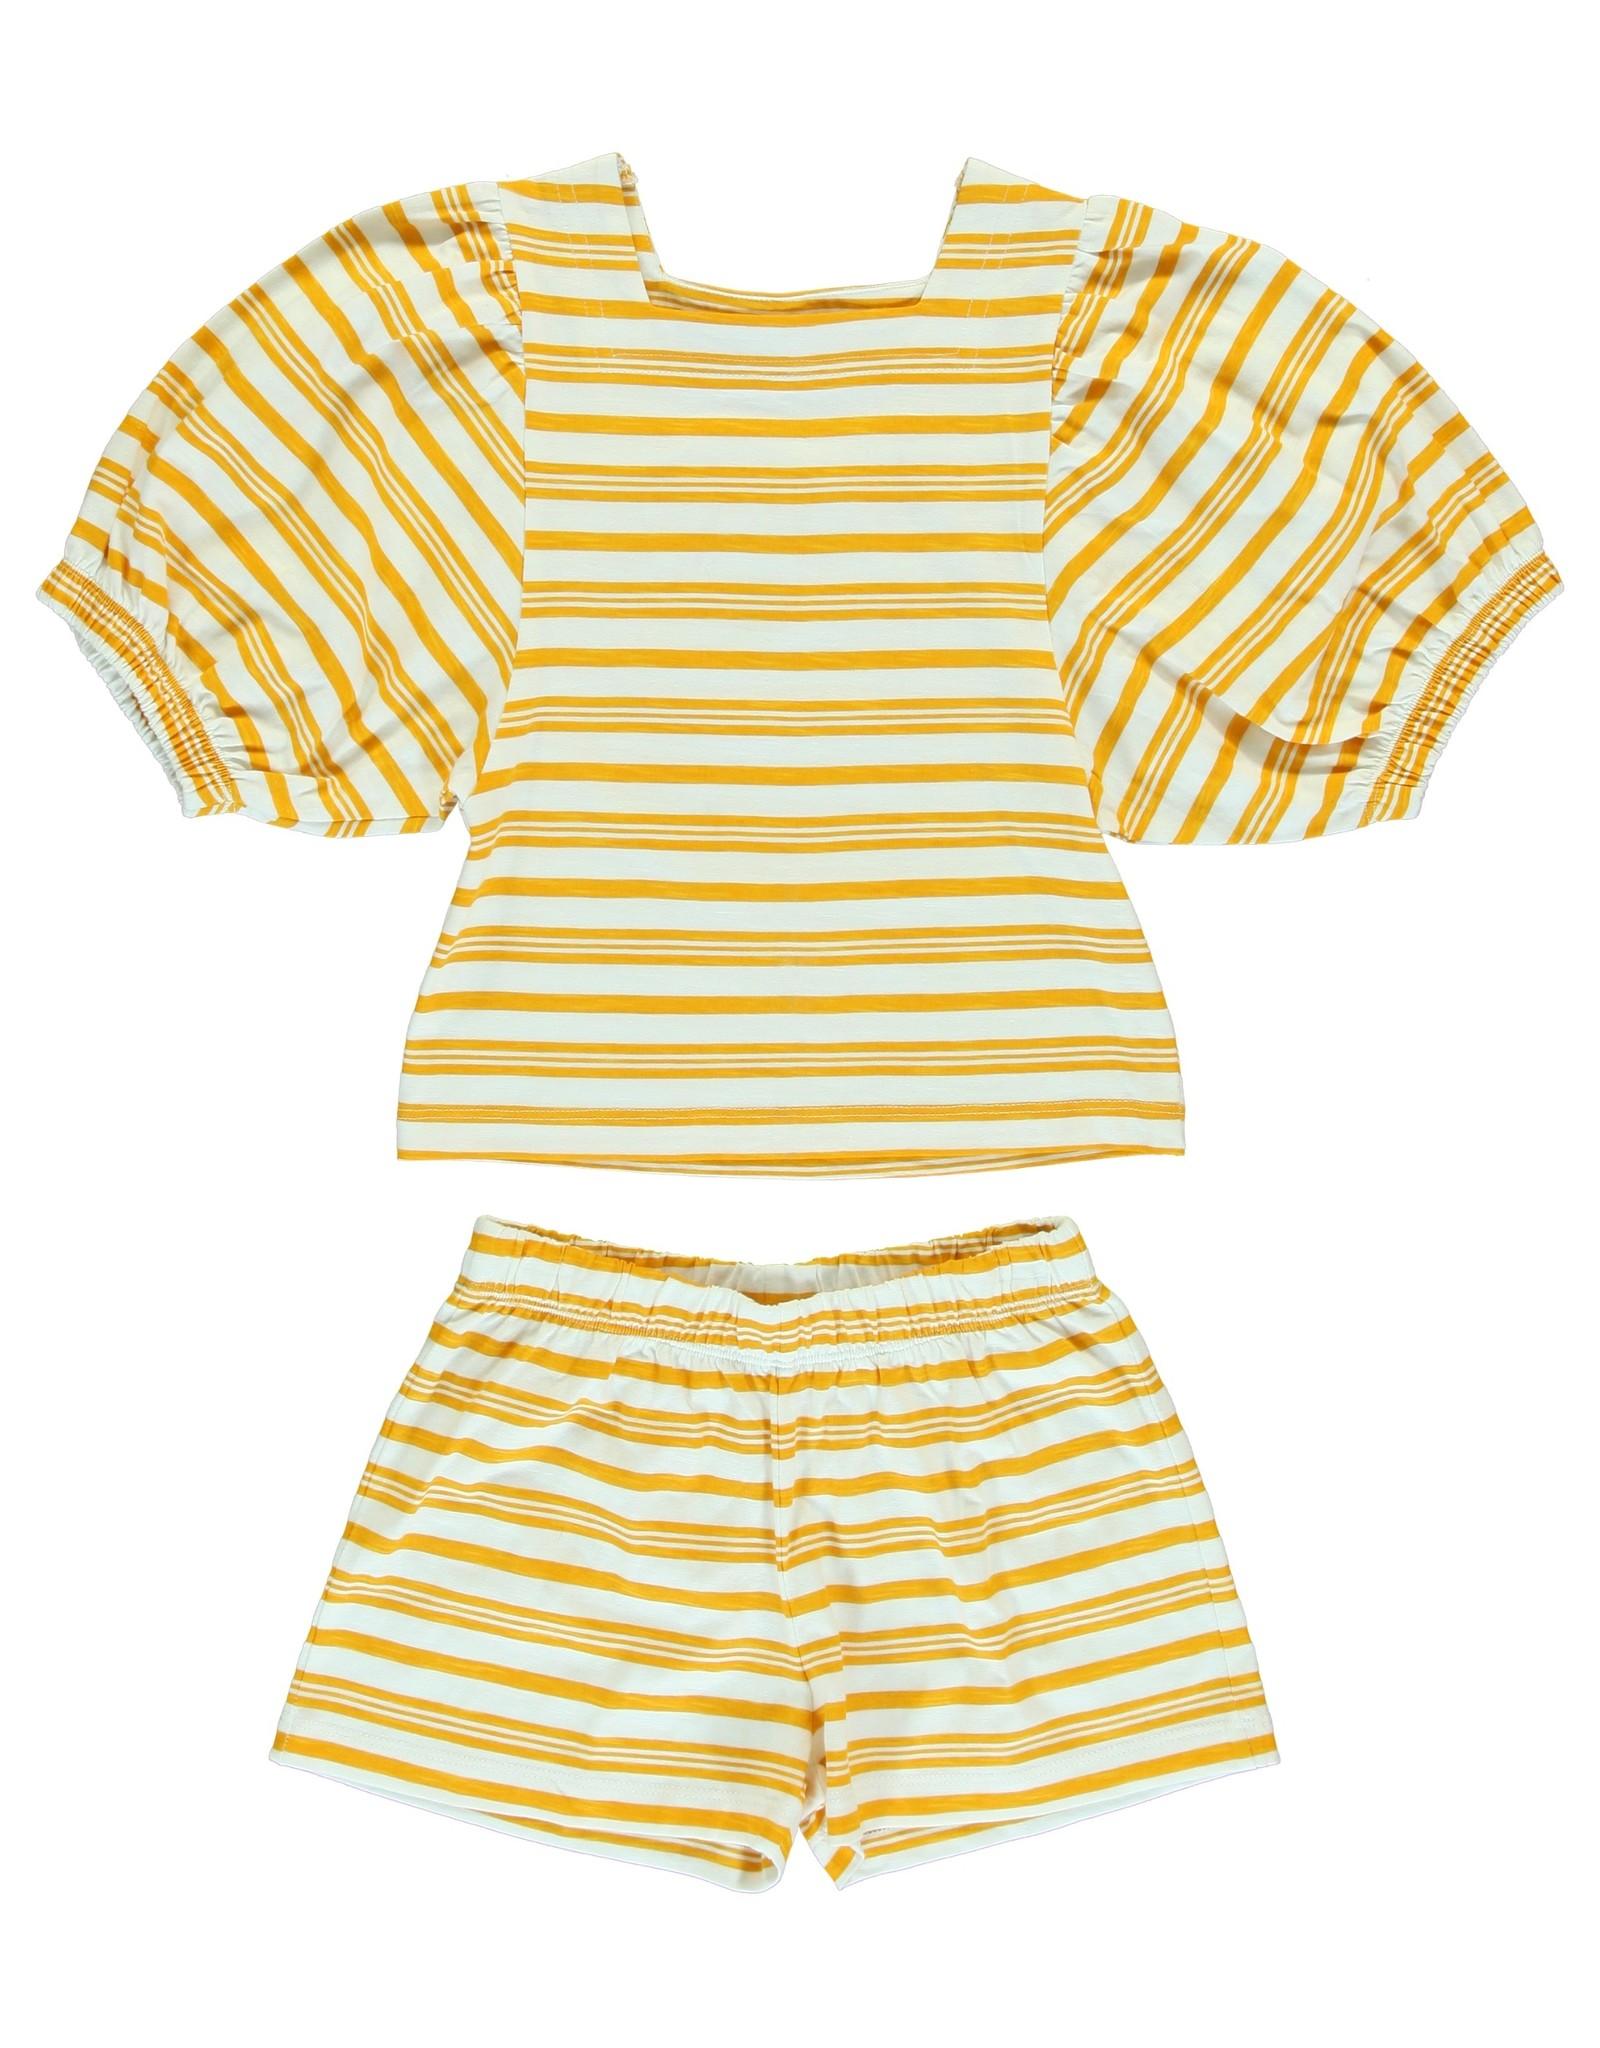 Dorélit Chaldene & Caroli   Pajama Set Jersey   Yellow